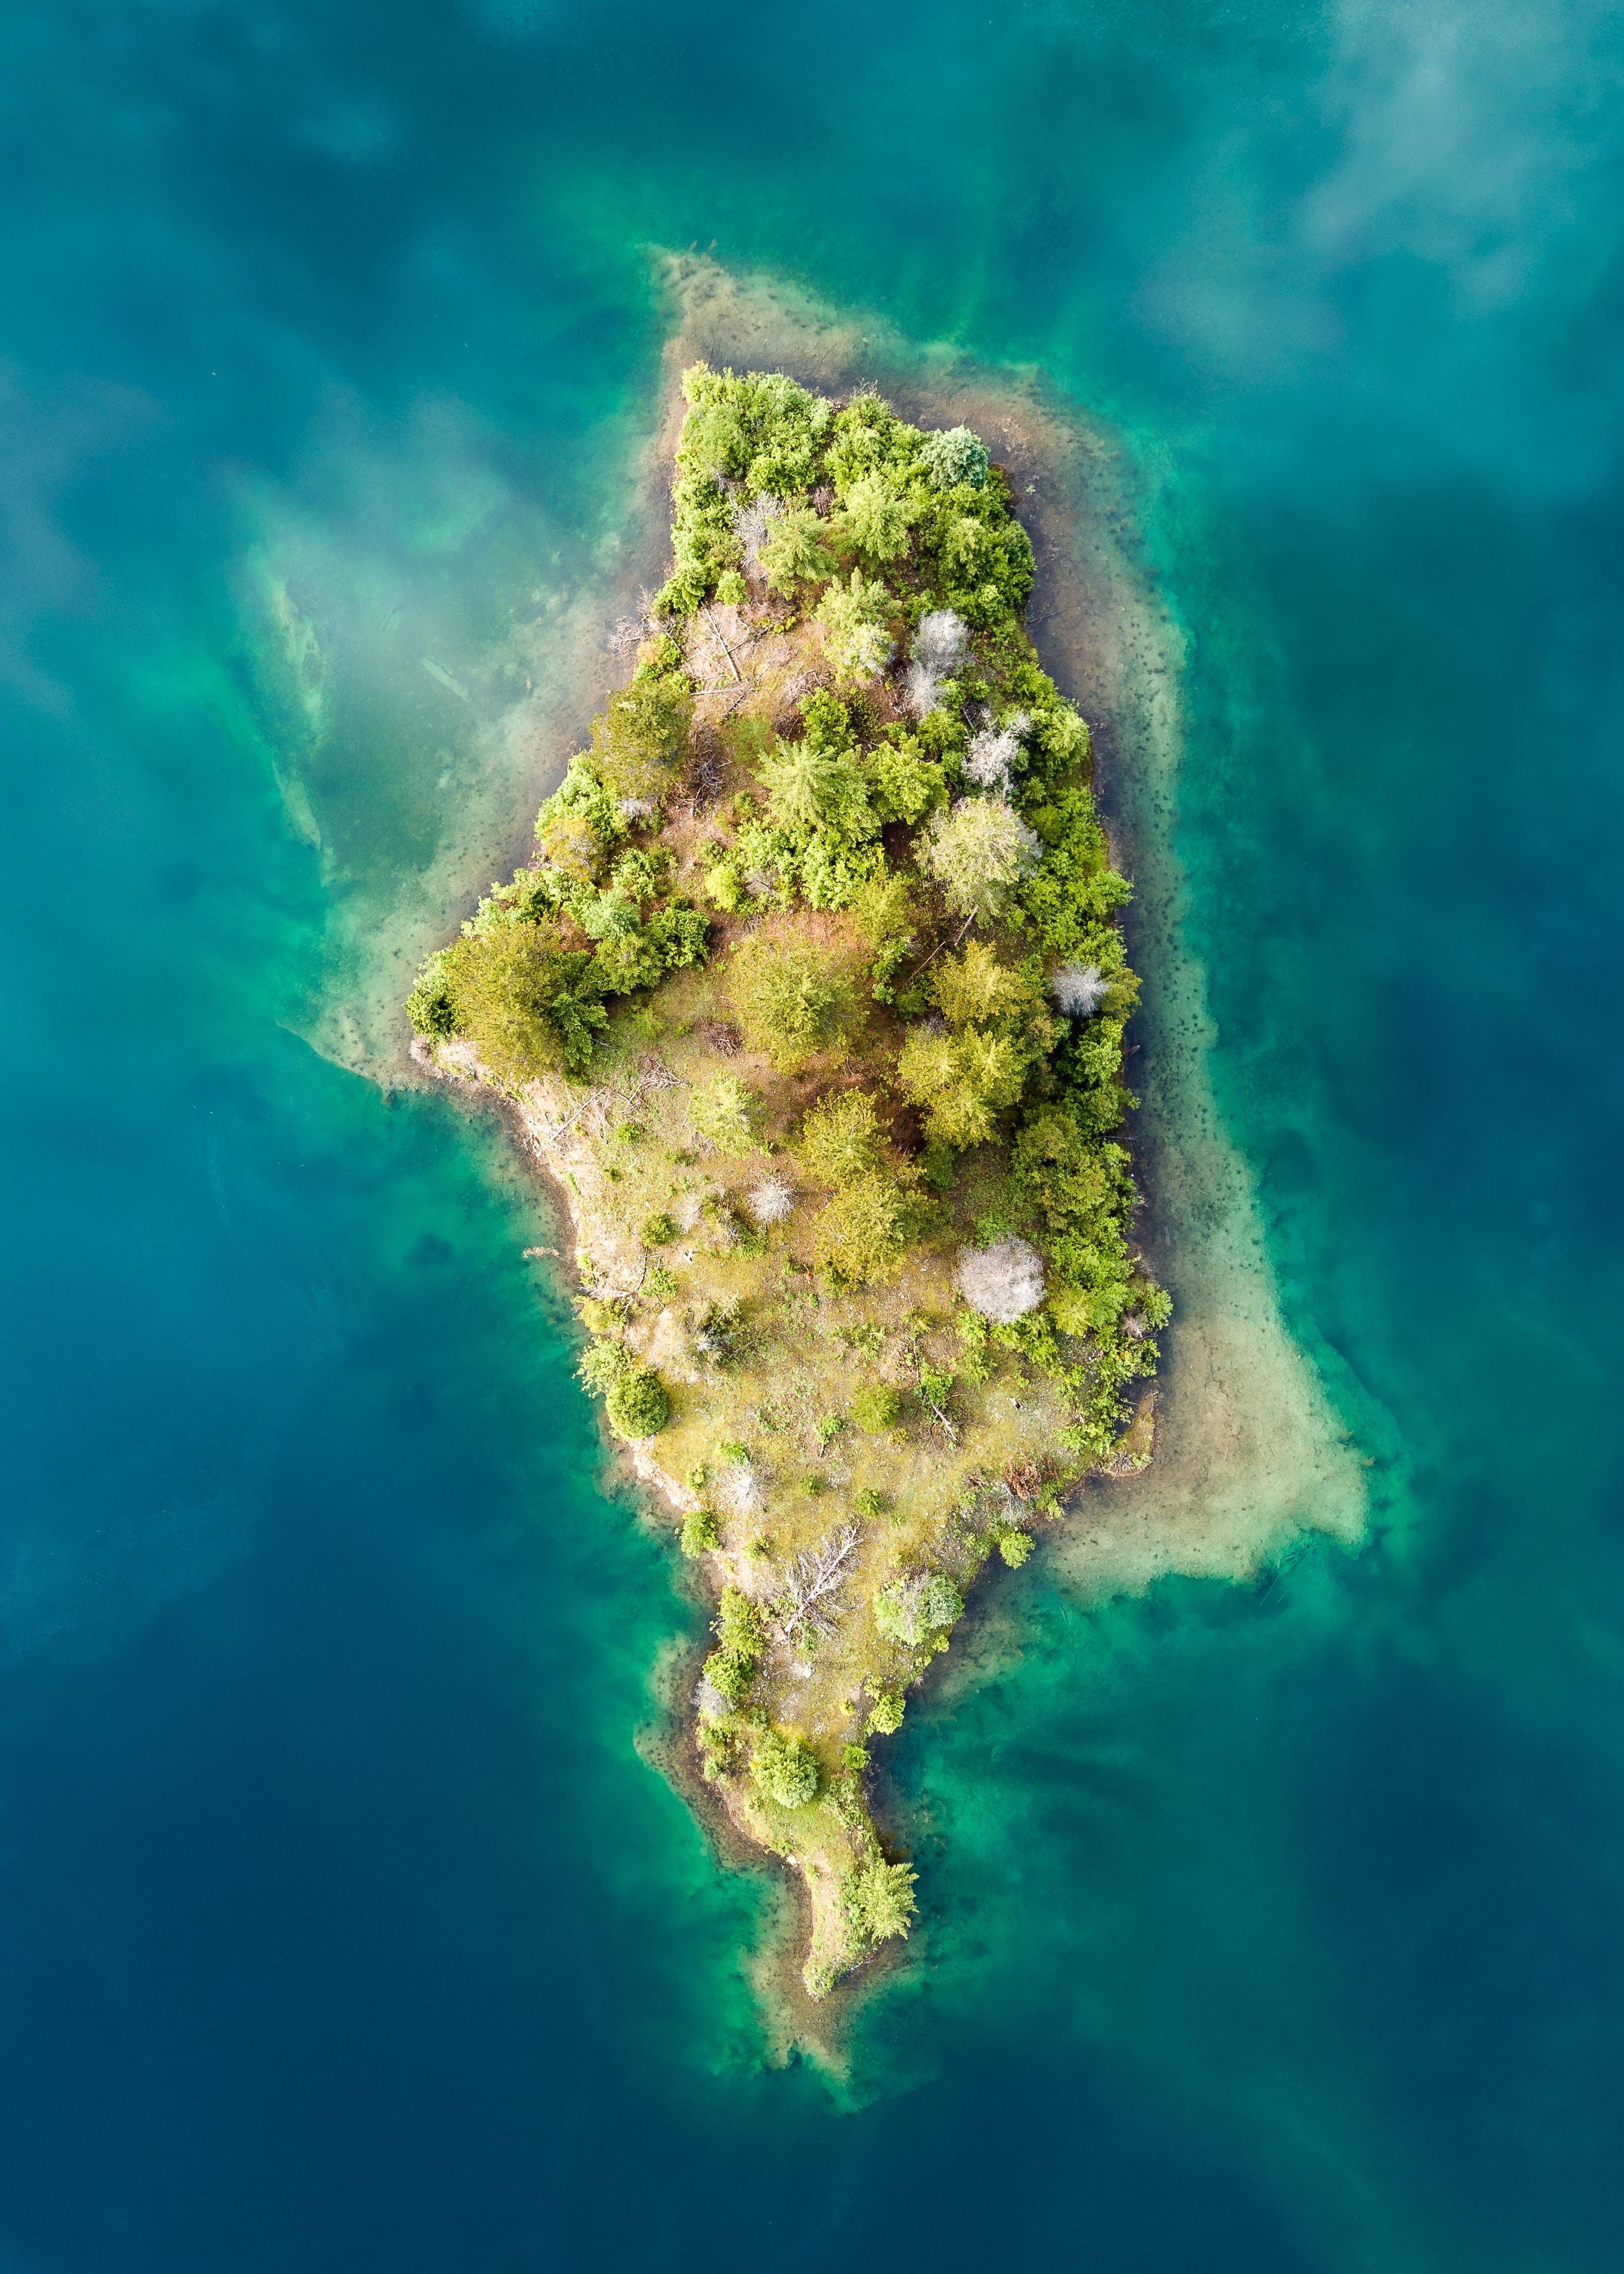 bird's eye view of islet